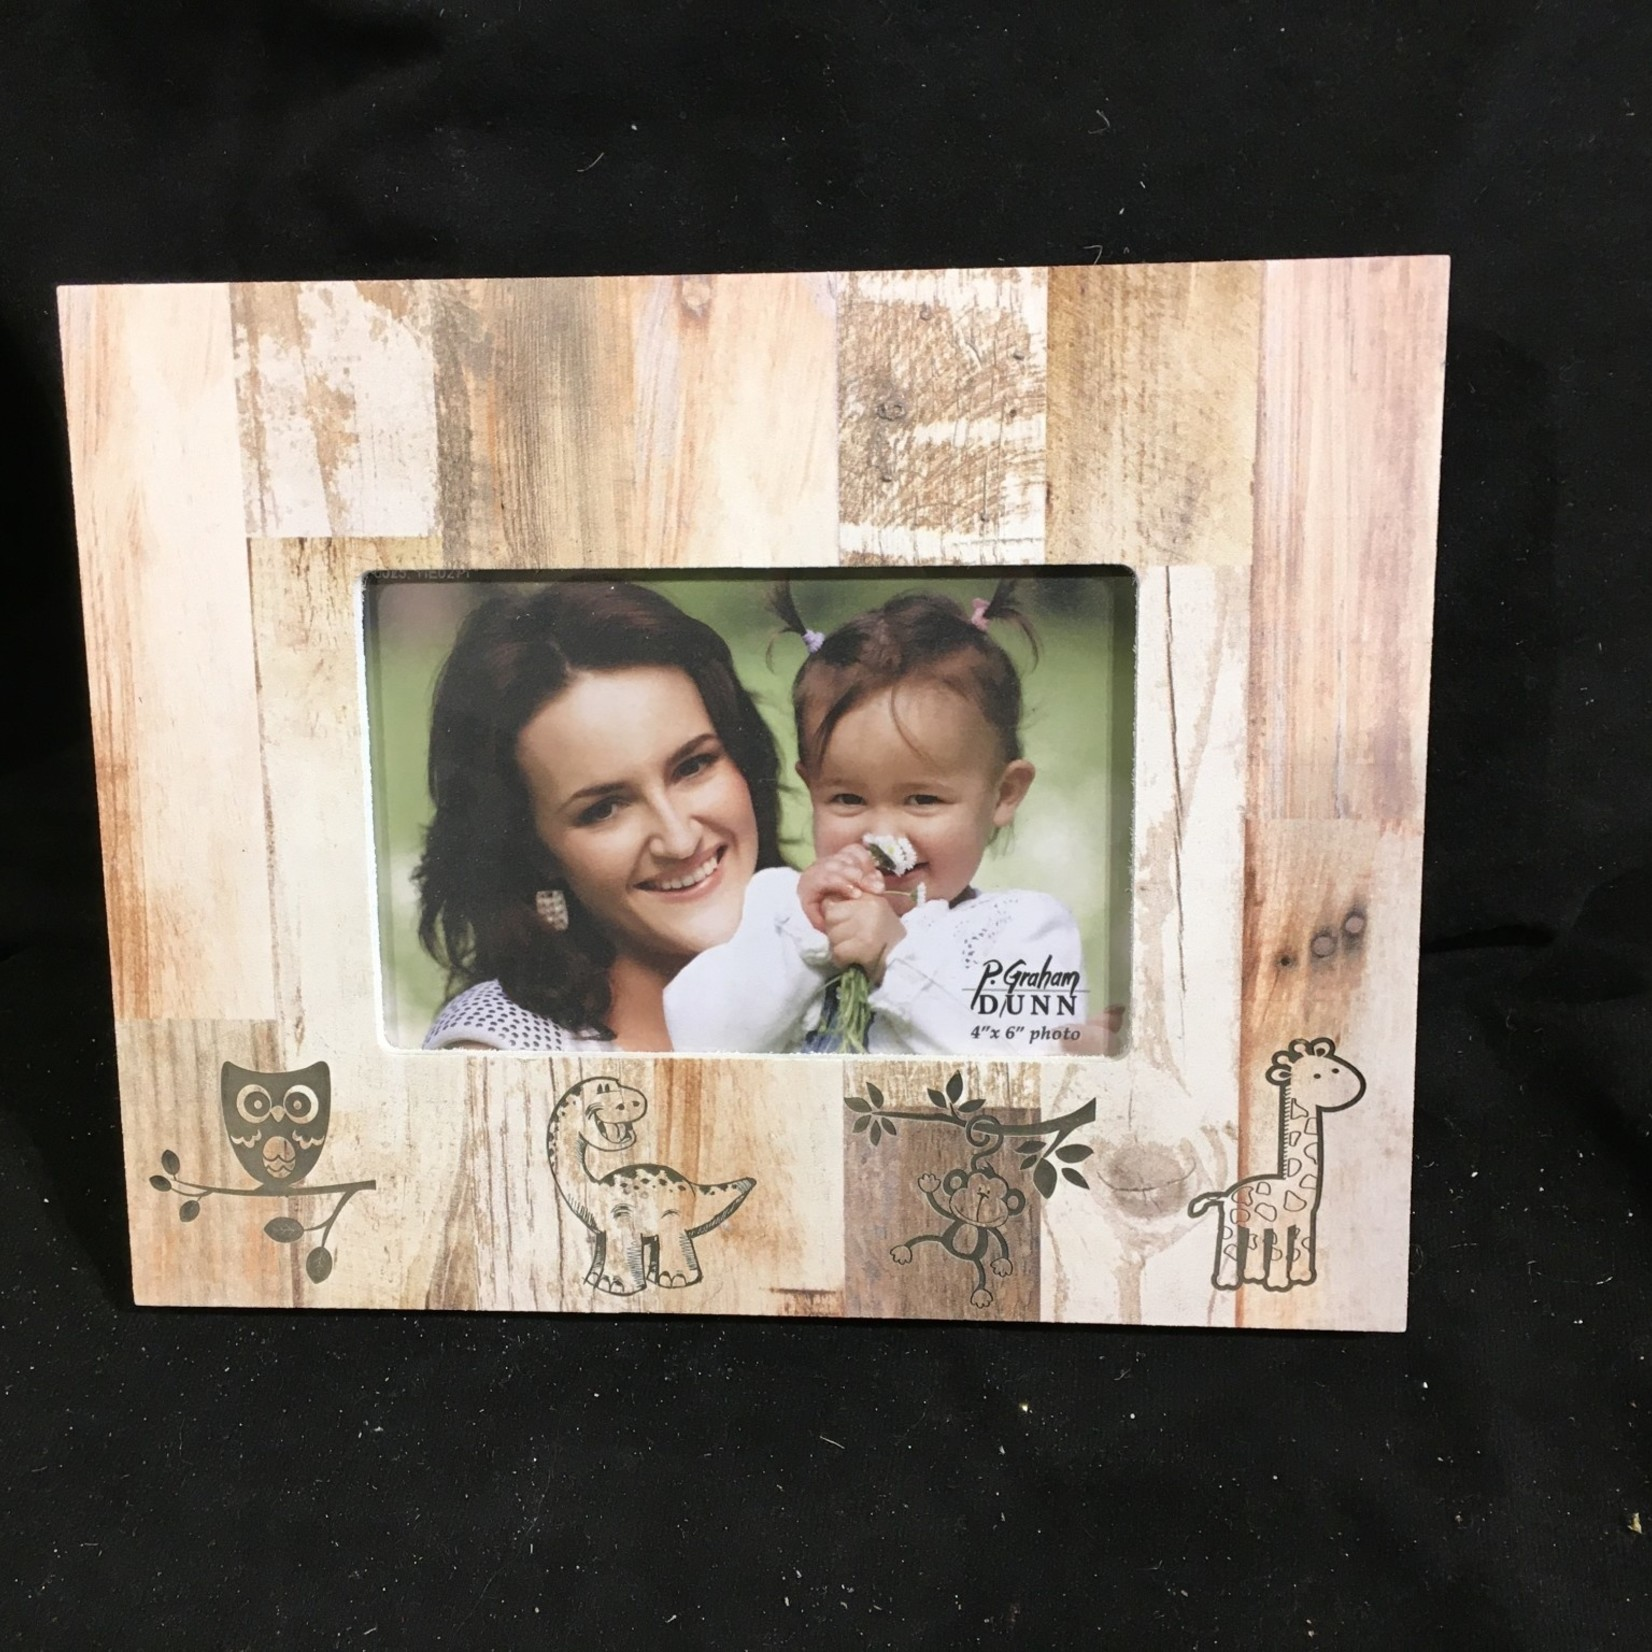 4x6 Photo Frame - Natural Wood